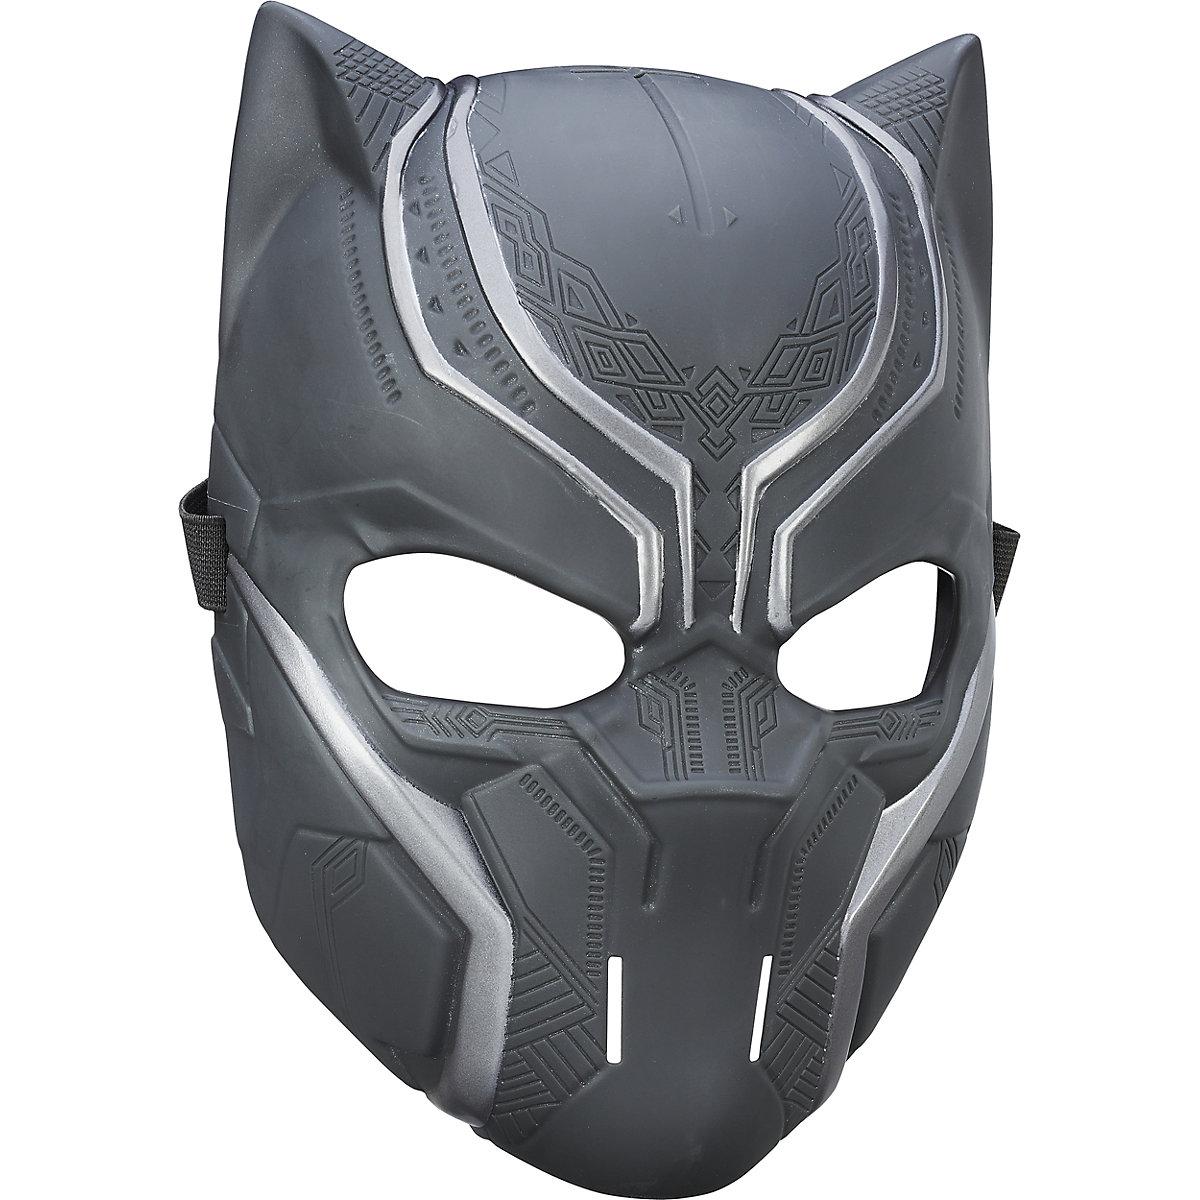 Hasbro Mask 5064753 Playsets Interactive Masks Aprilpromo Avengers Marvel Black Panther MTpromo